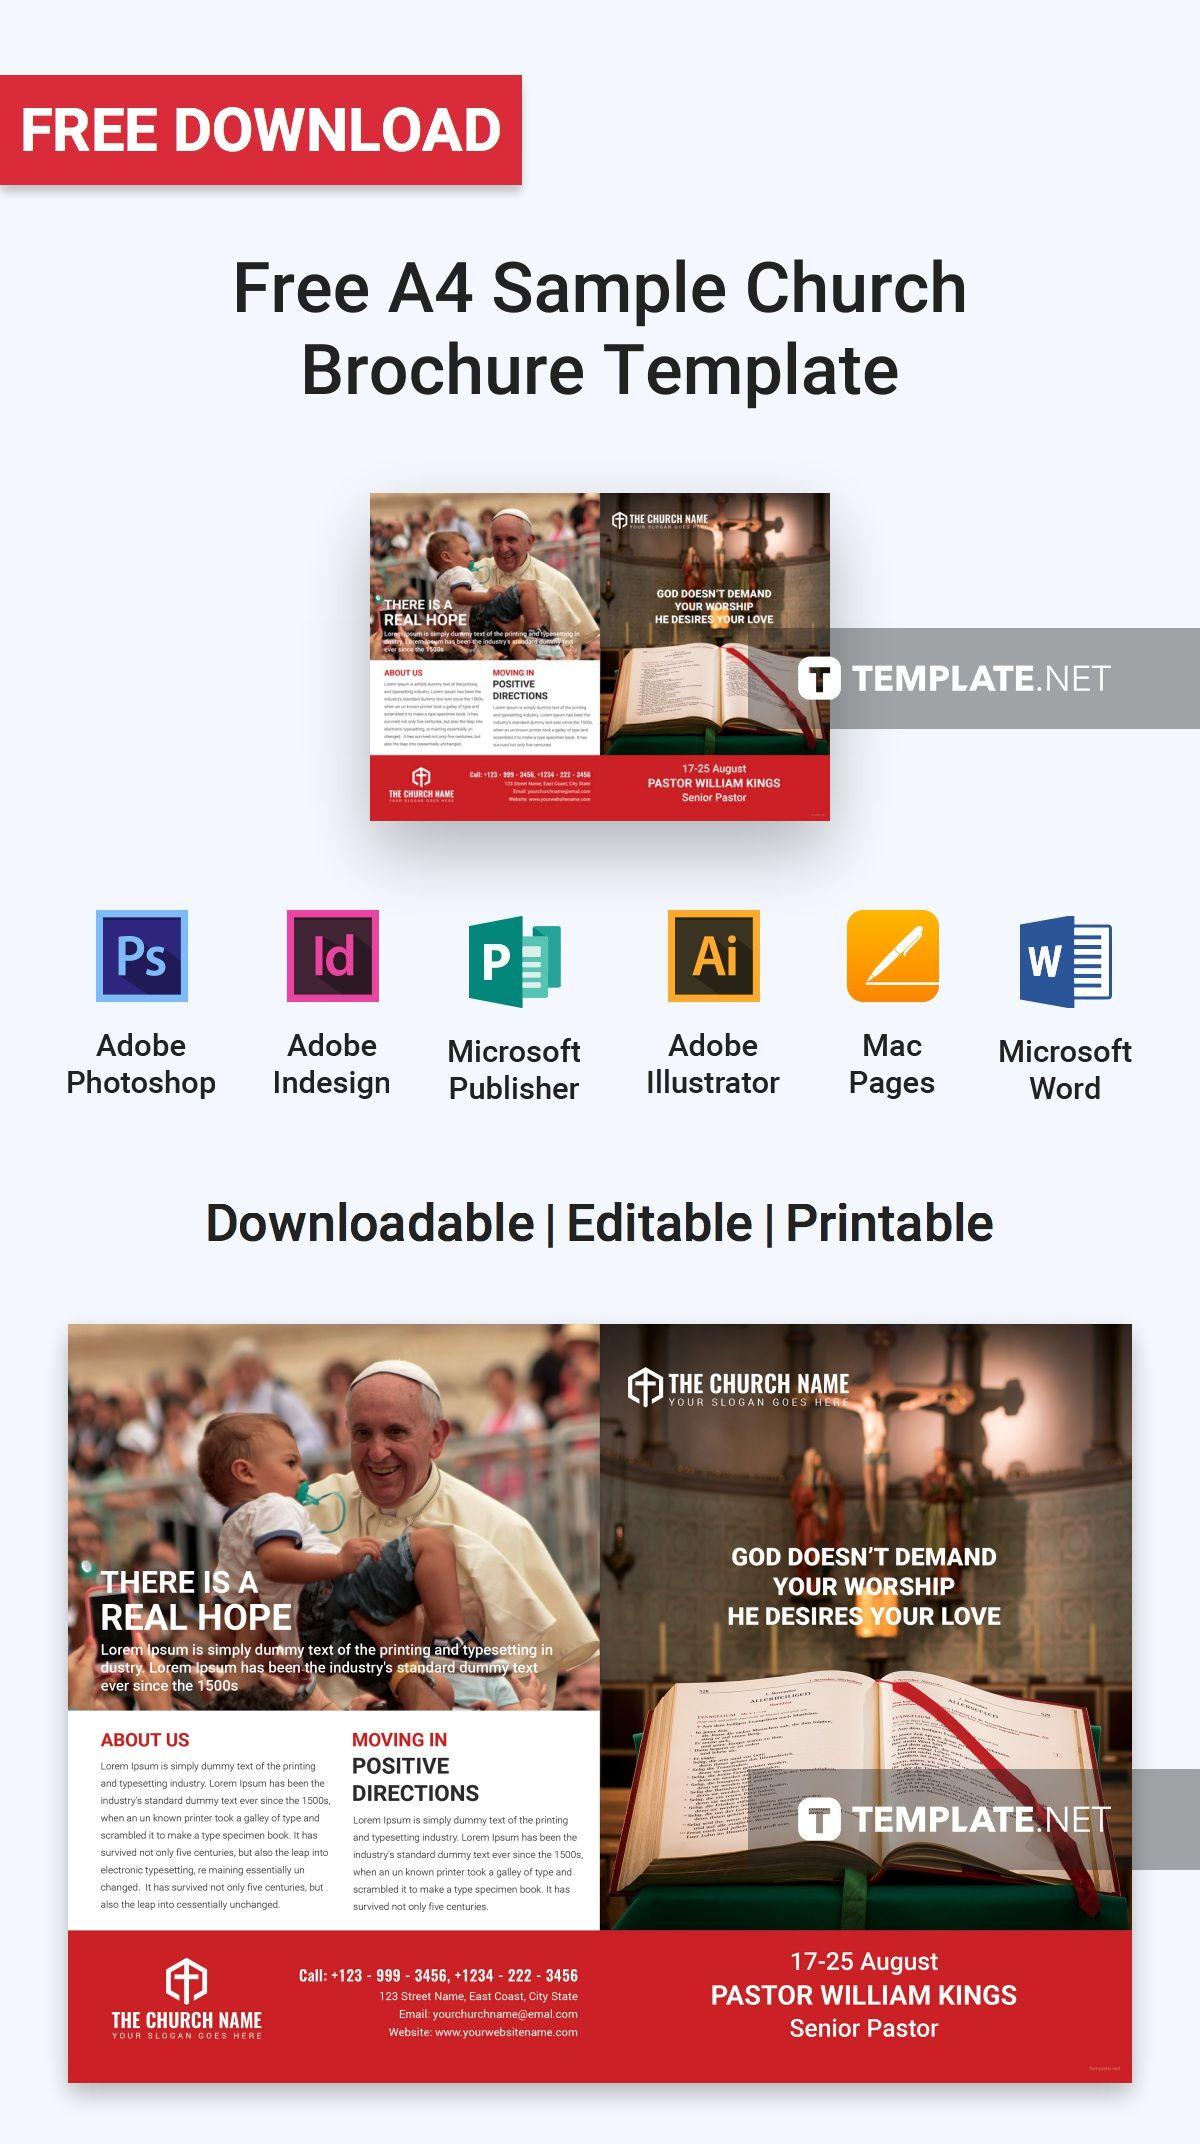 free a4 sample church brochure brochure templates design 2019